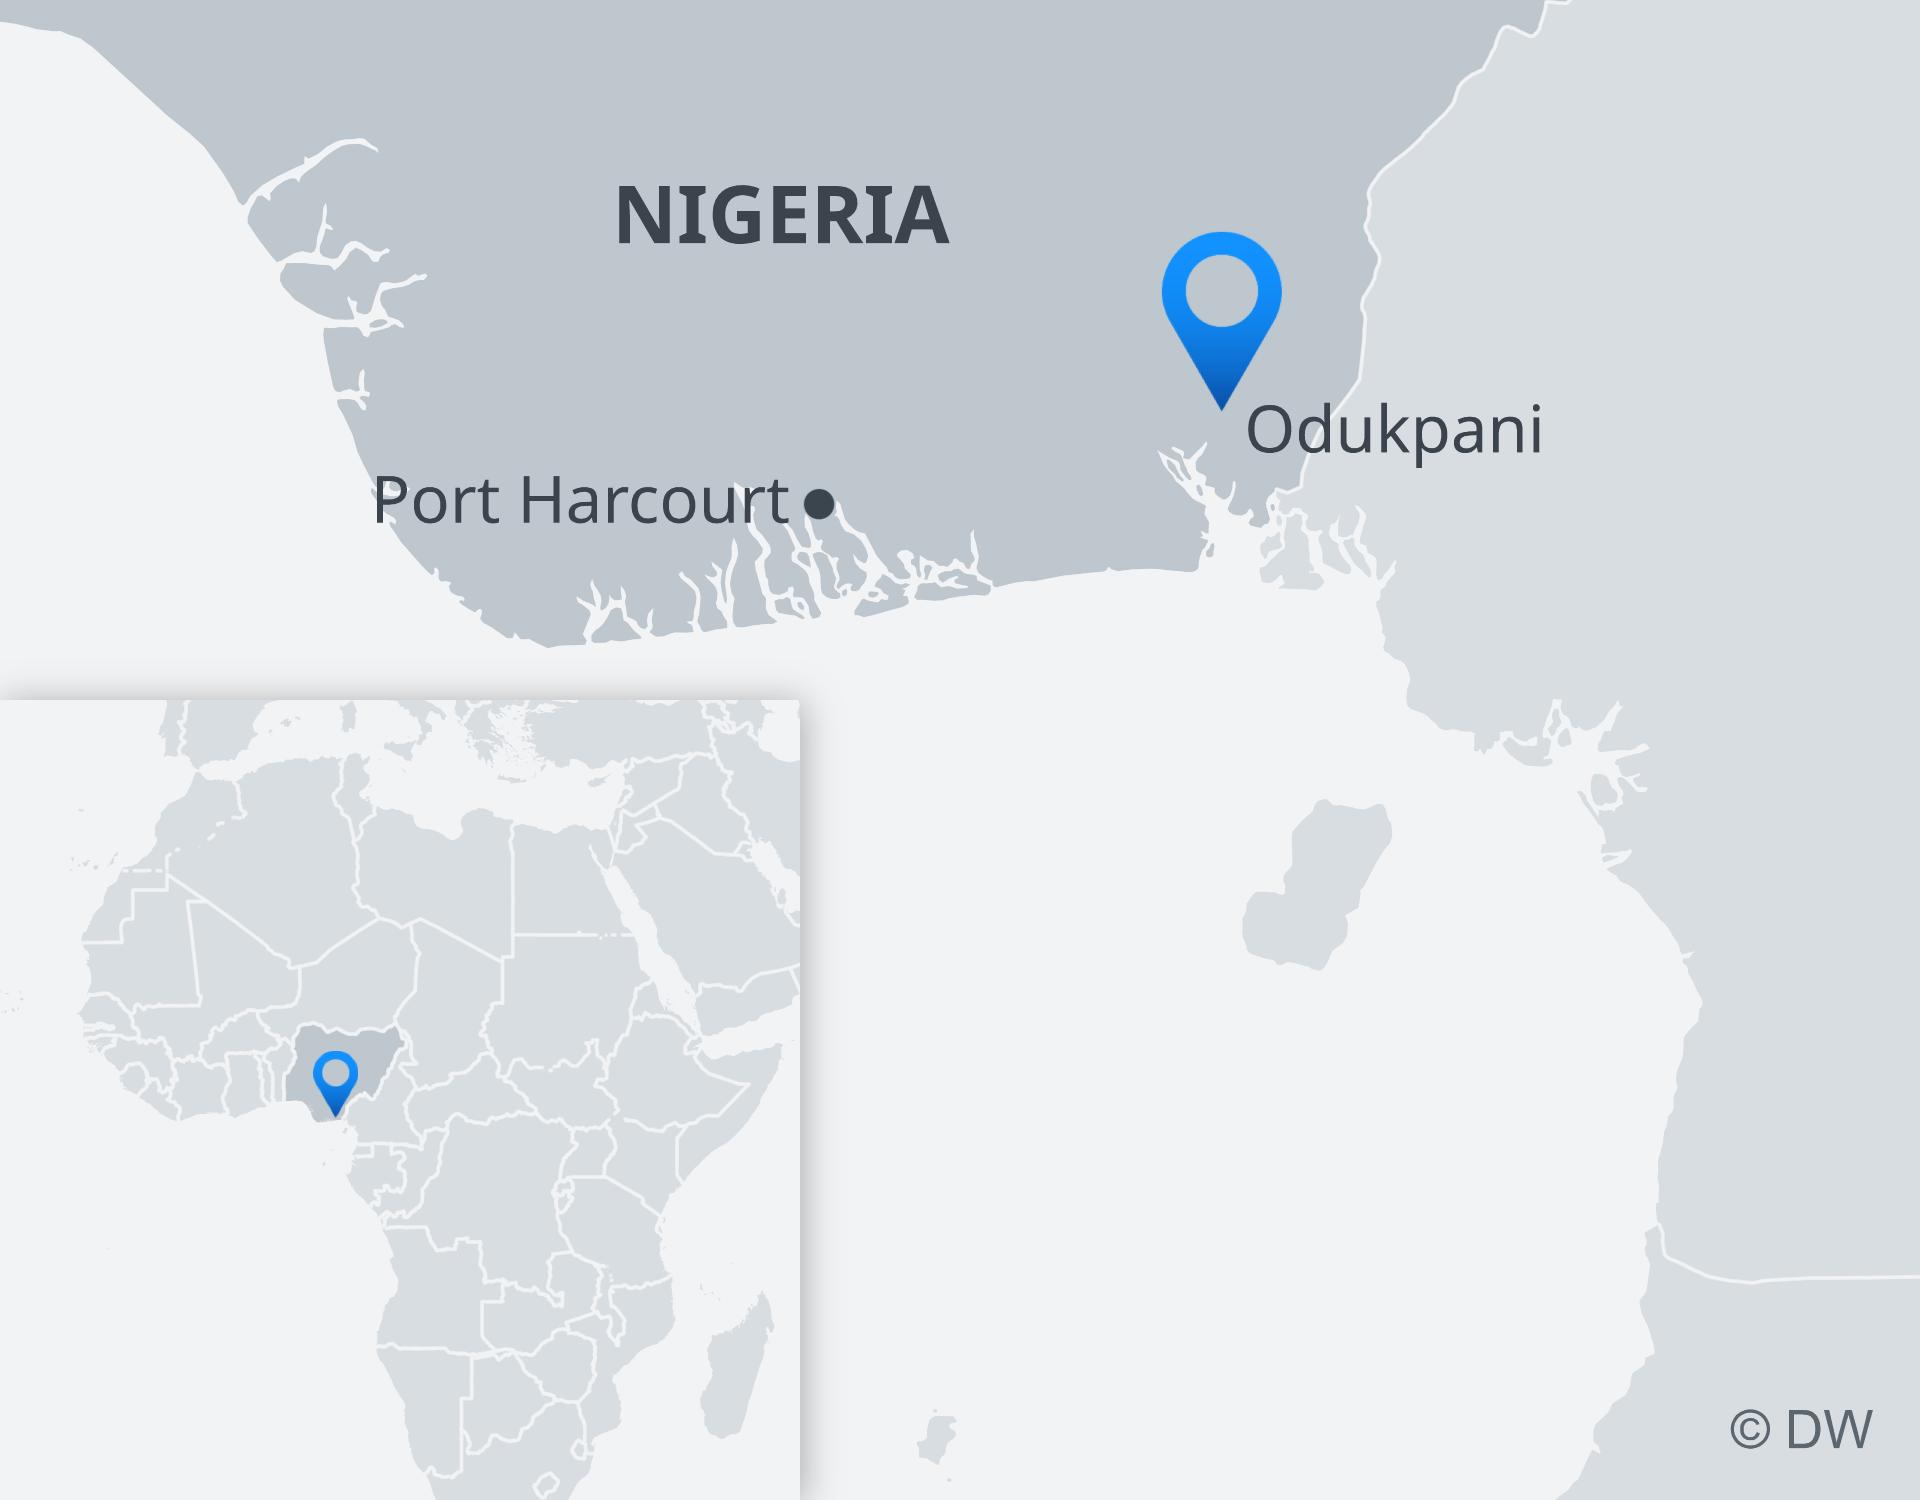 Mapa de la explosion de petroleo en la zona de Nigeria